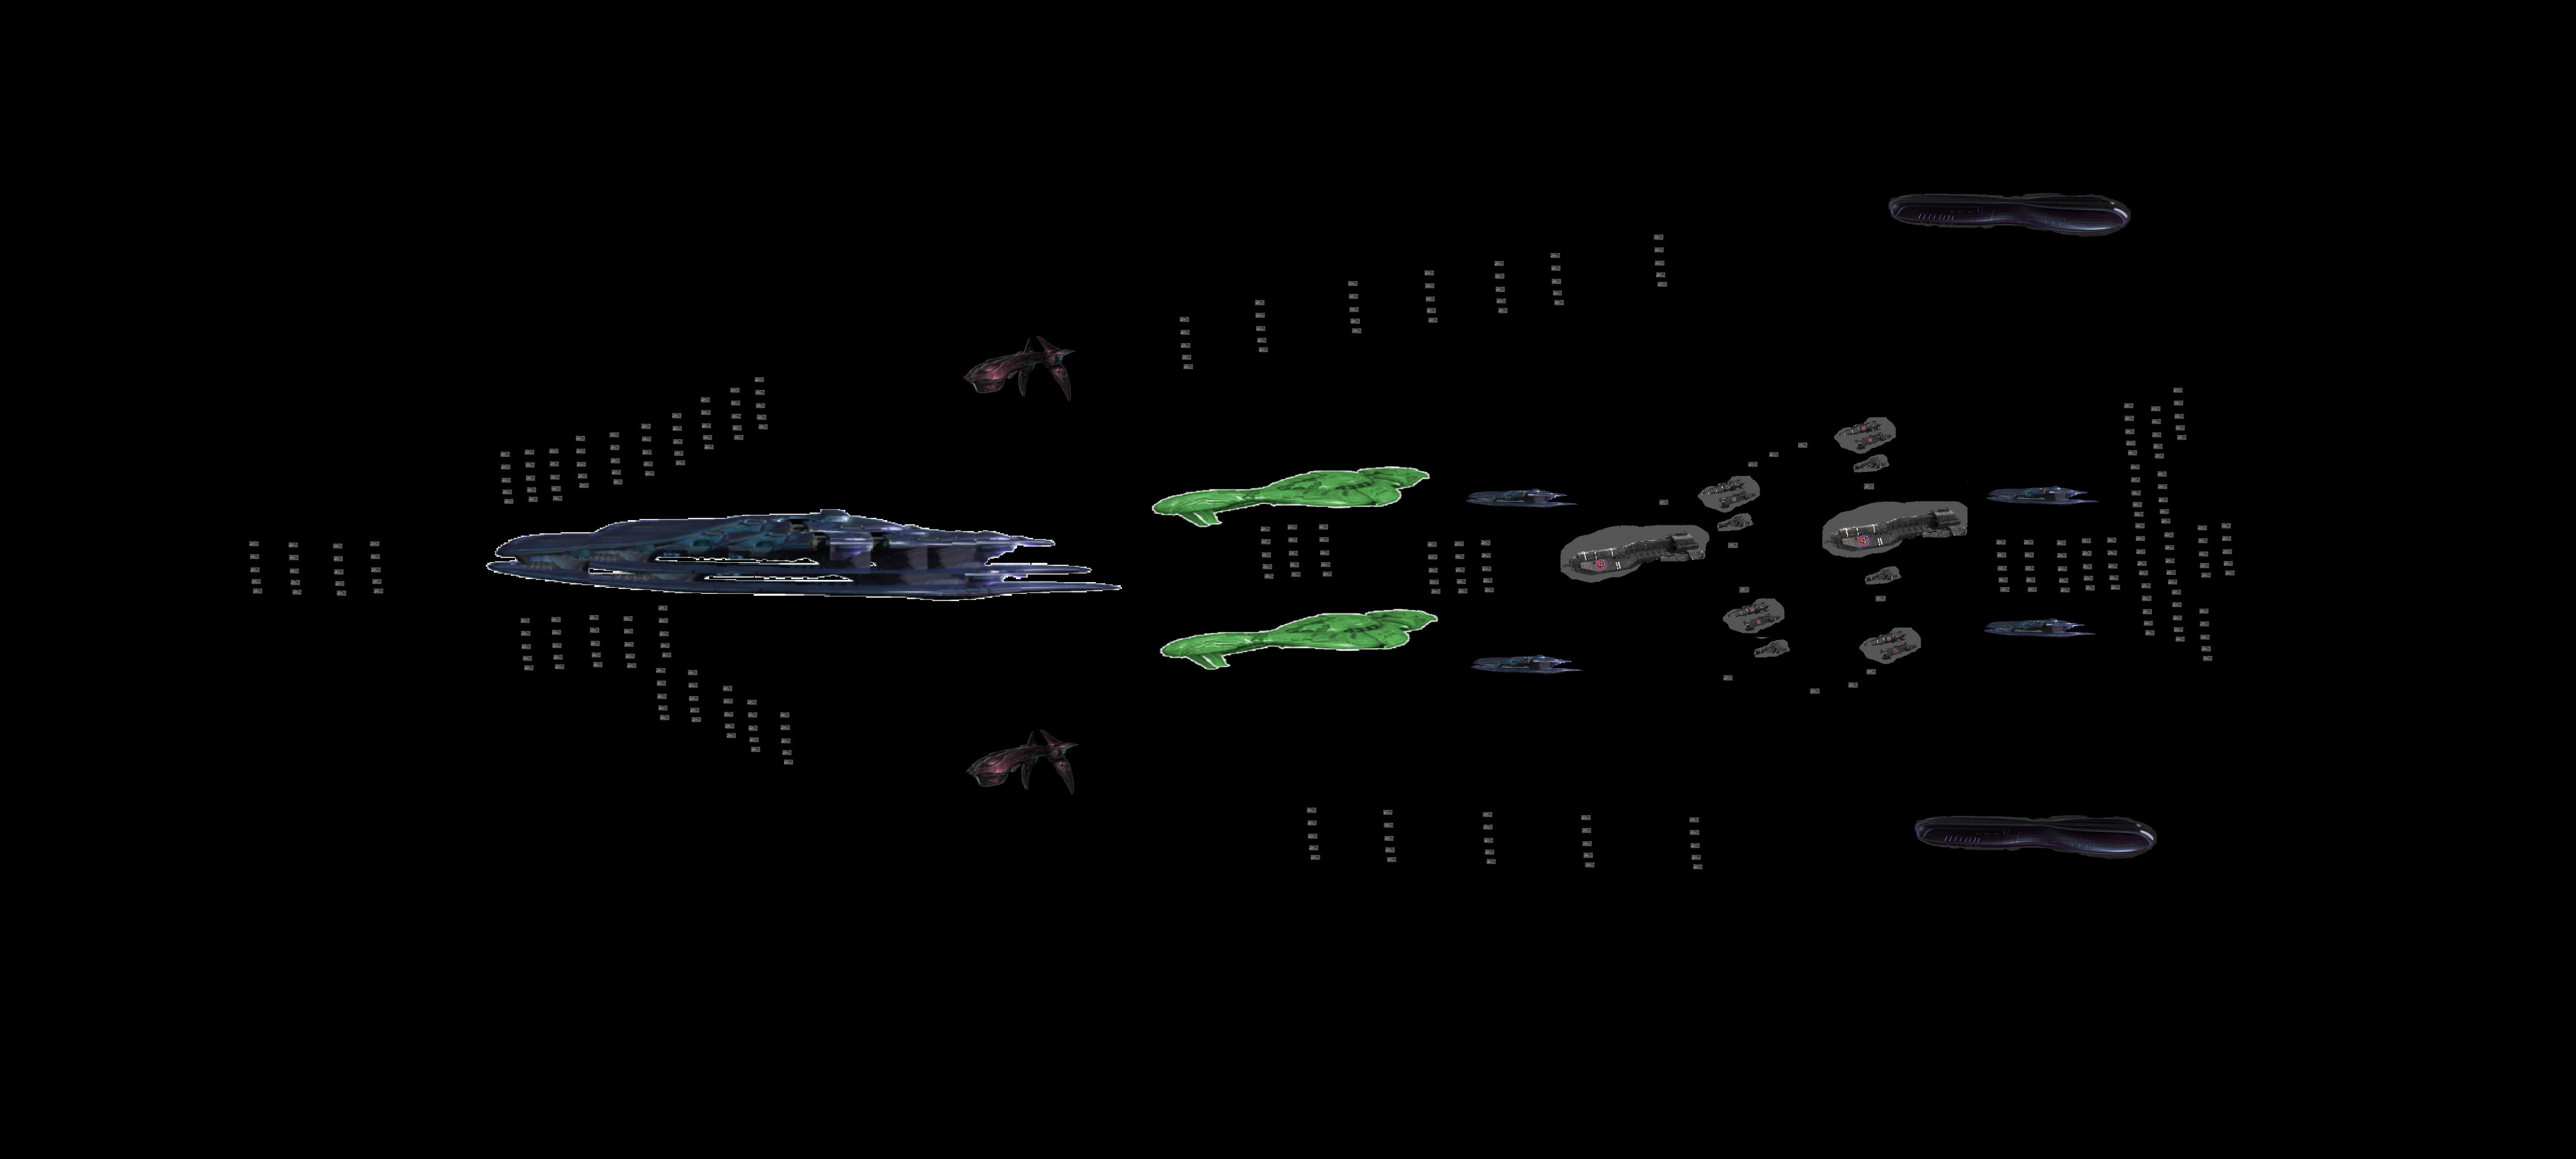 Star_fleet_13.jpg